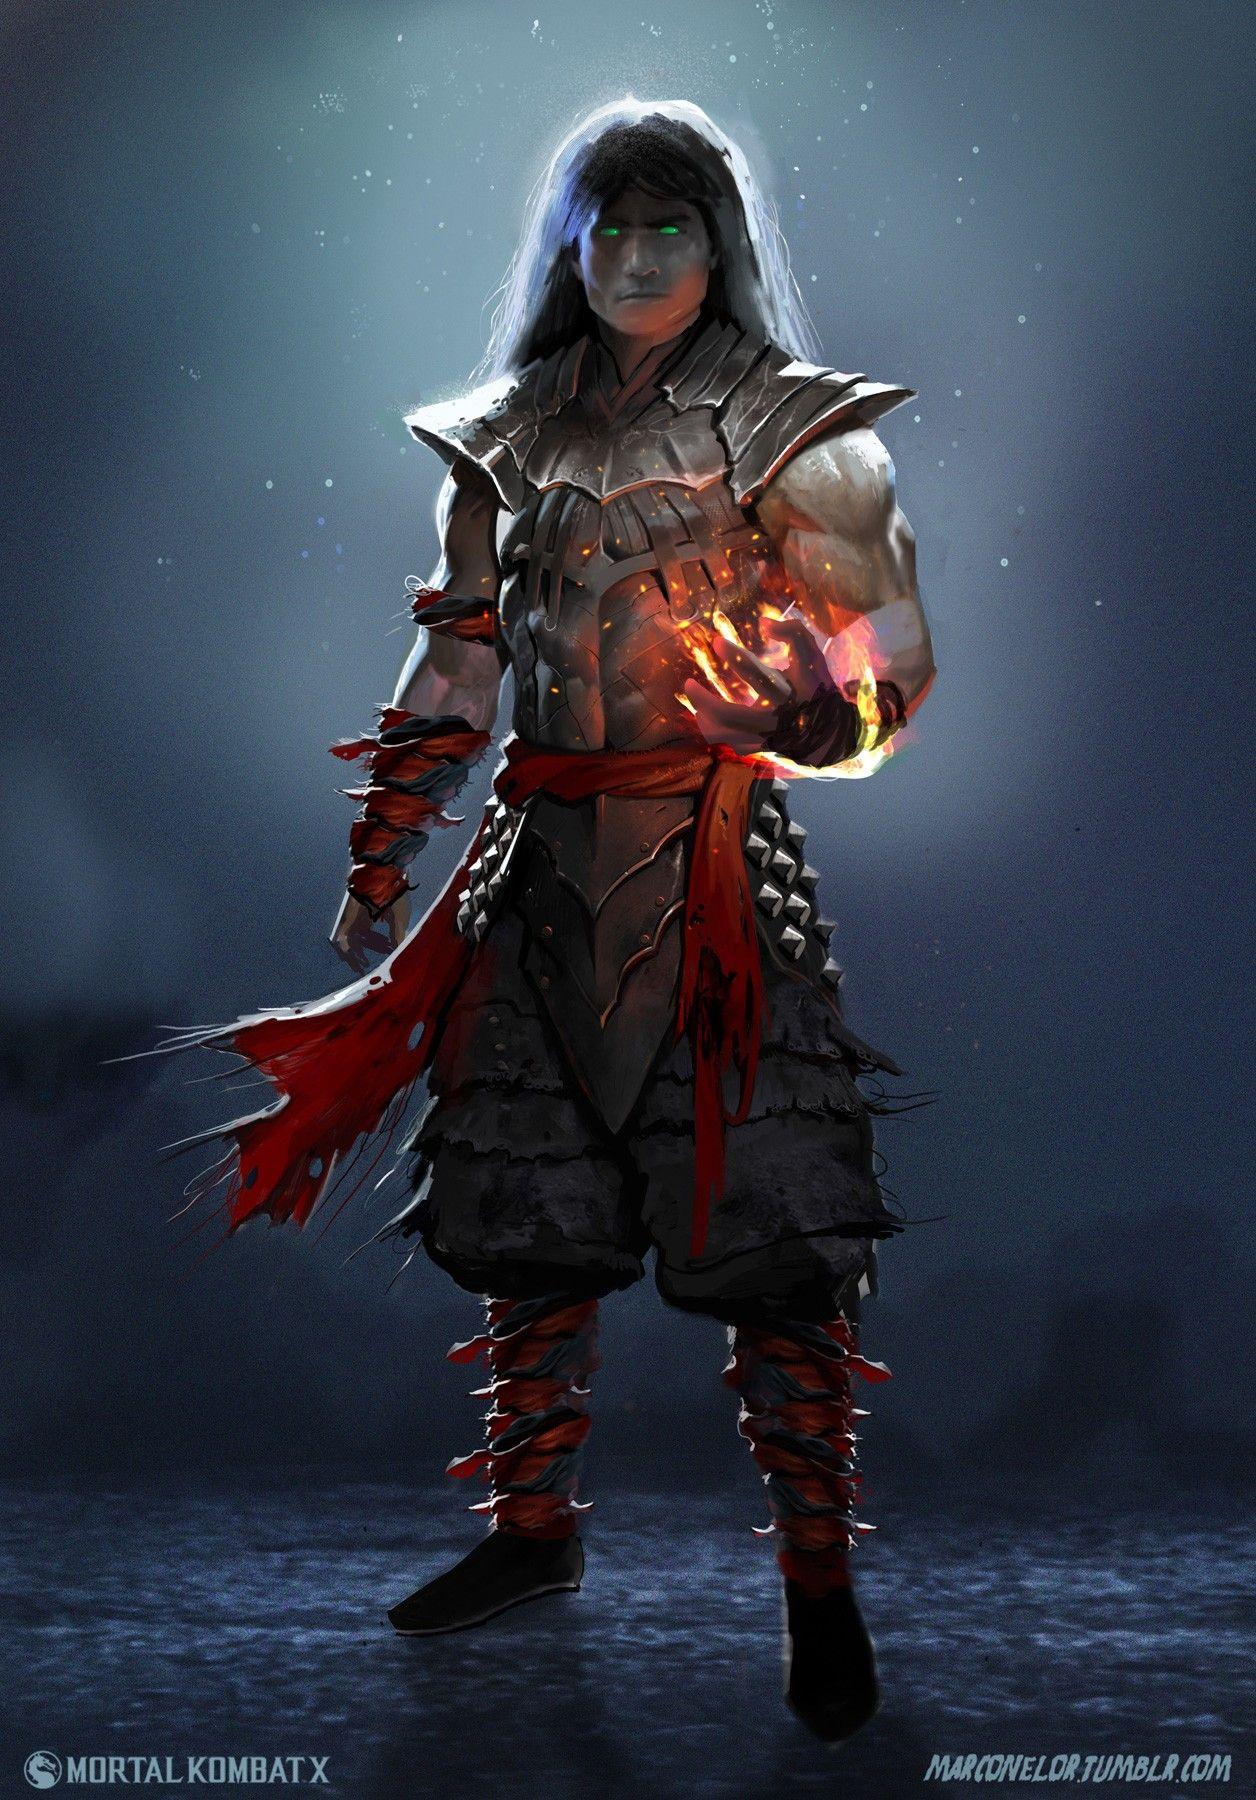 General 1256x1800 Mortal Kombat X Concept Art Digital Art Artwork Video Games Liu Kang Mortal Kombat Characters Mortal Kombat Art Mortal Kombat